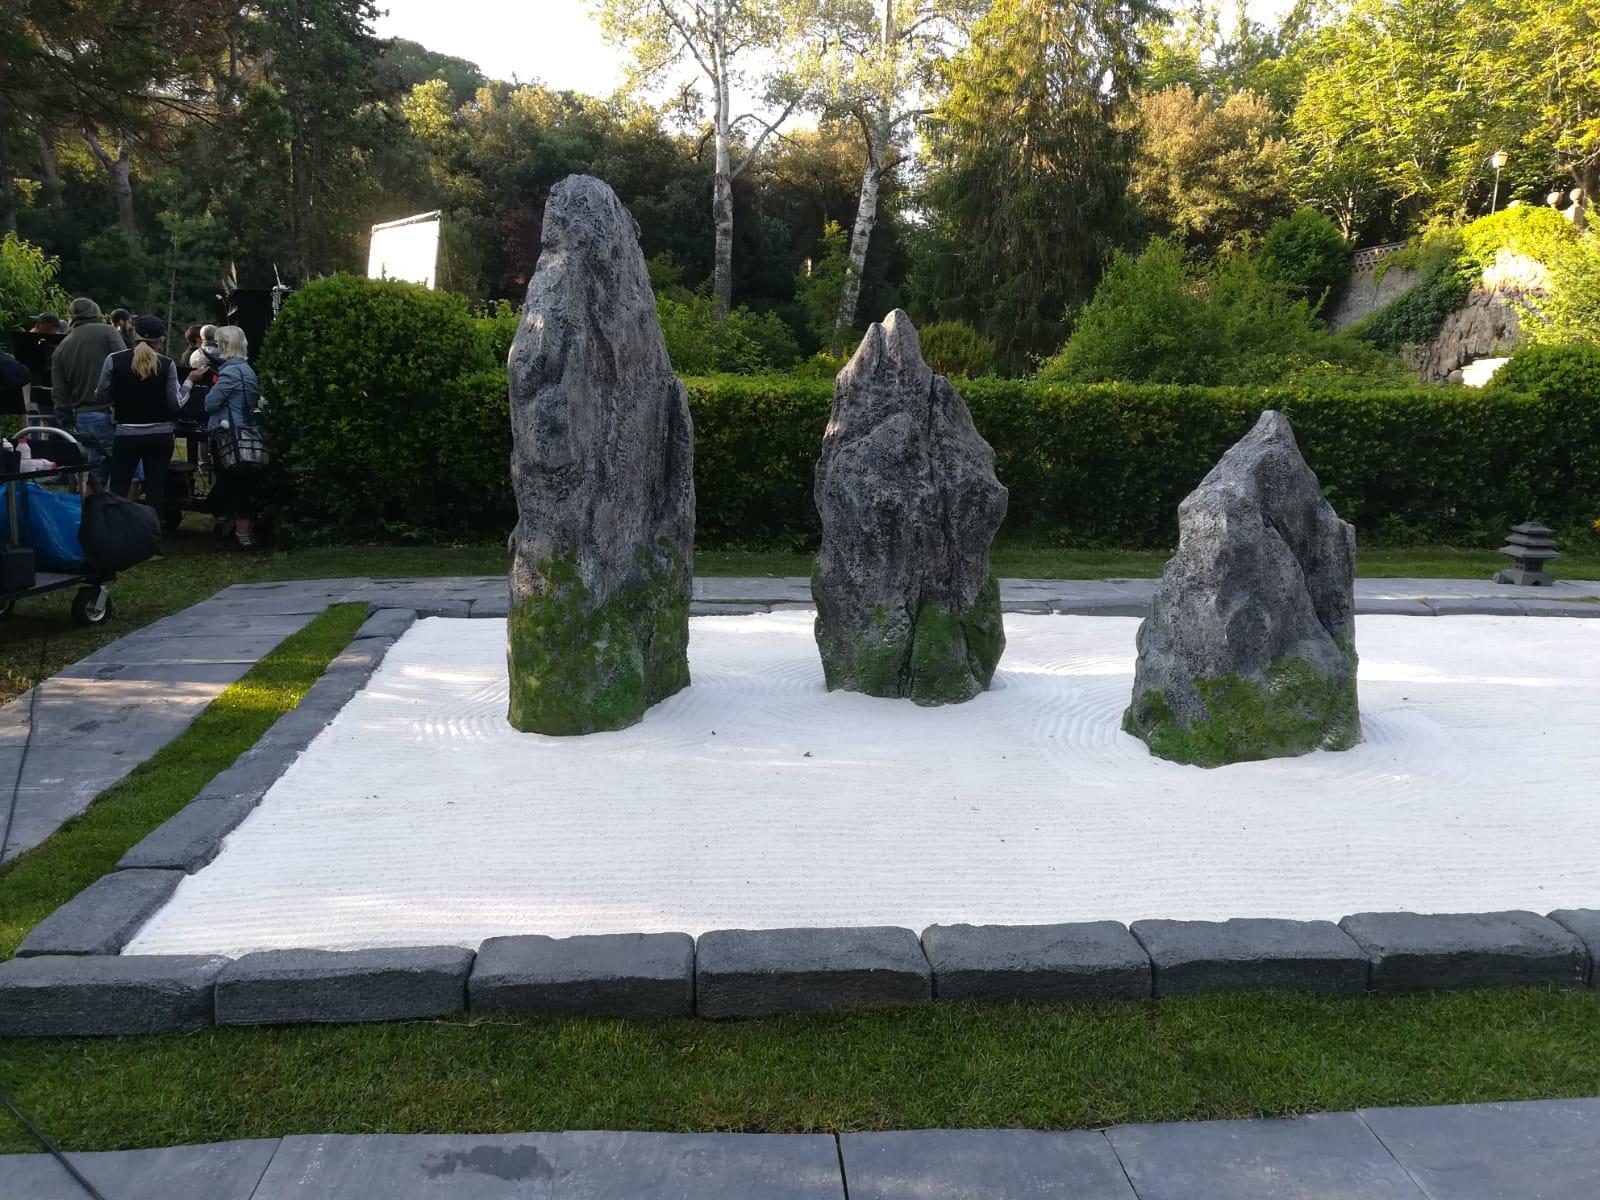 Jardin Mineral Zen Photo zen garden. fake stones for advertisment. barcelona, 2018